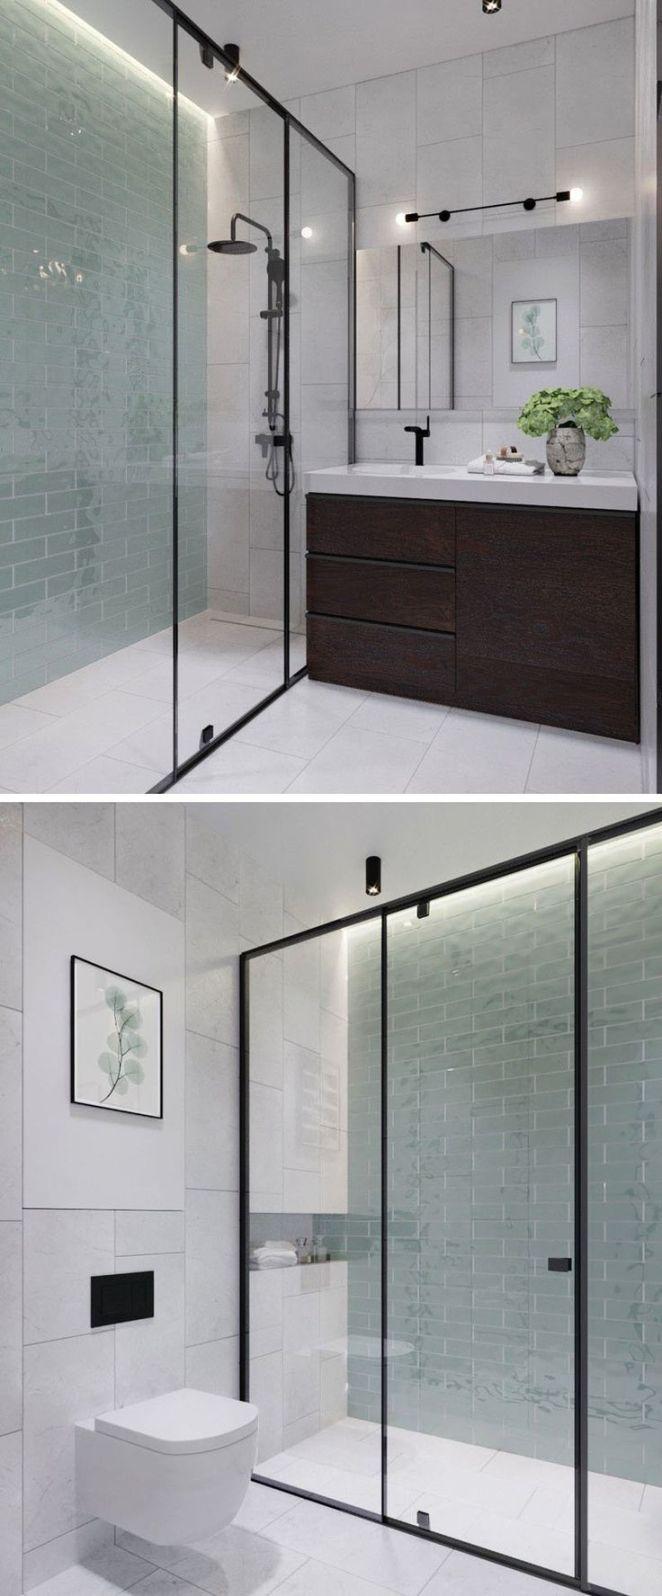 Idée décoration Salle de bain - salle de bain mur bleu canard ...